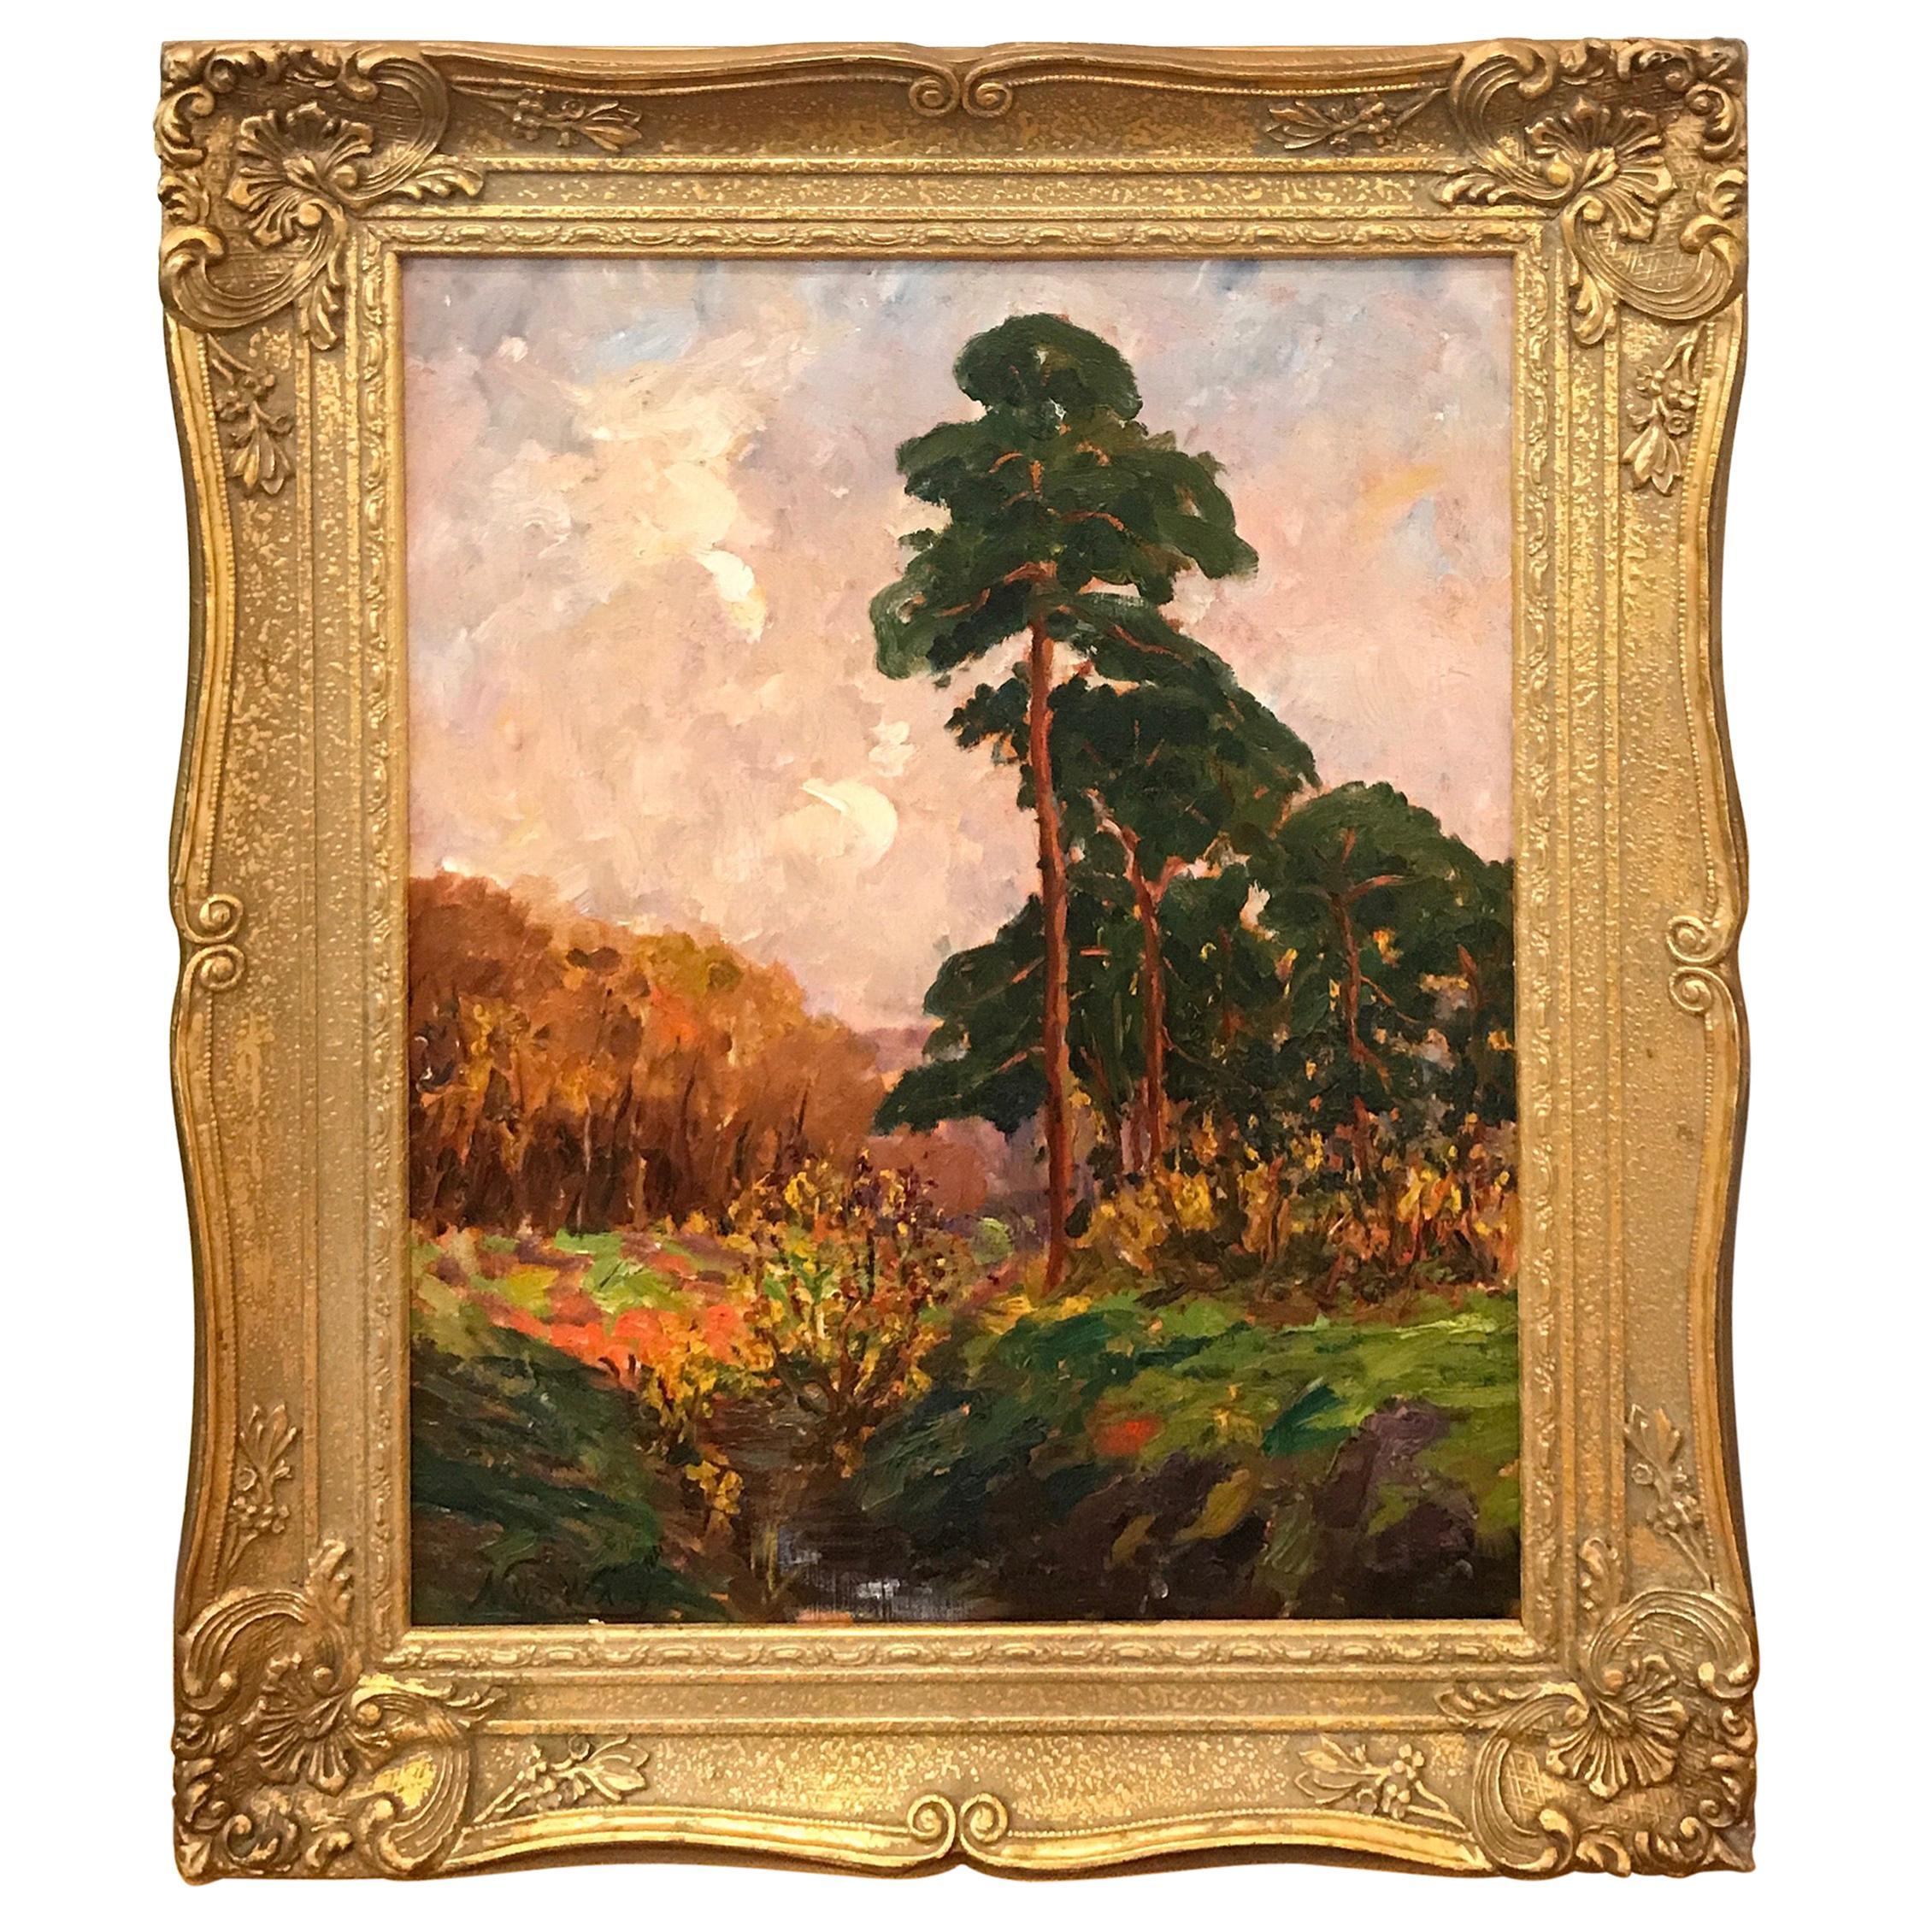 Impressionist Landscape by Nicolaas Van Der Waay, Dutch '1855-1936'